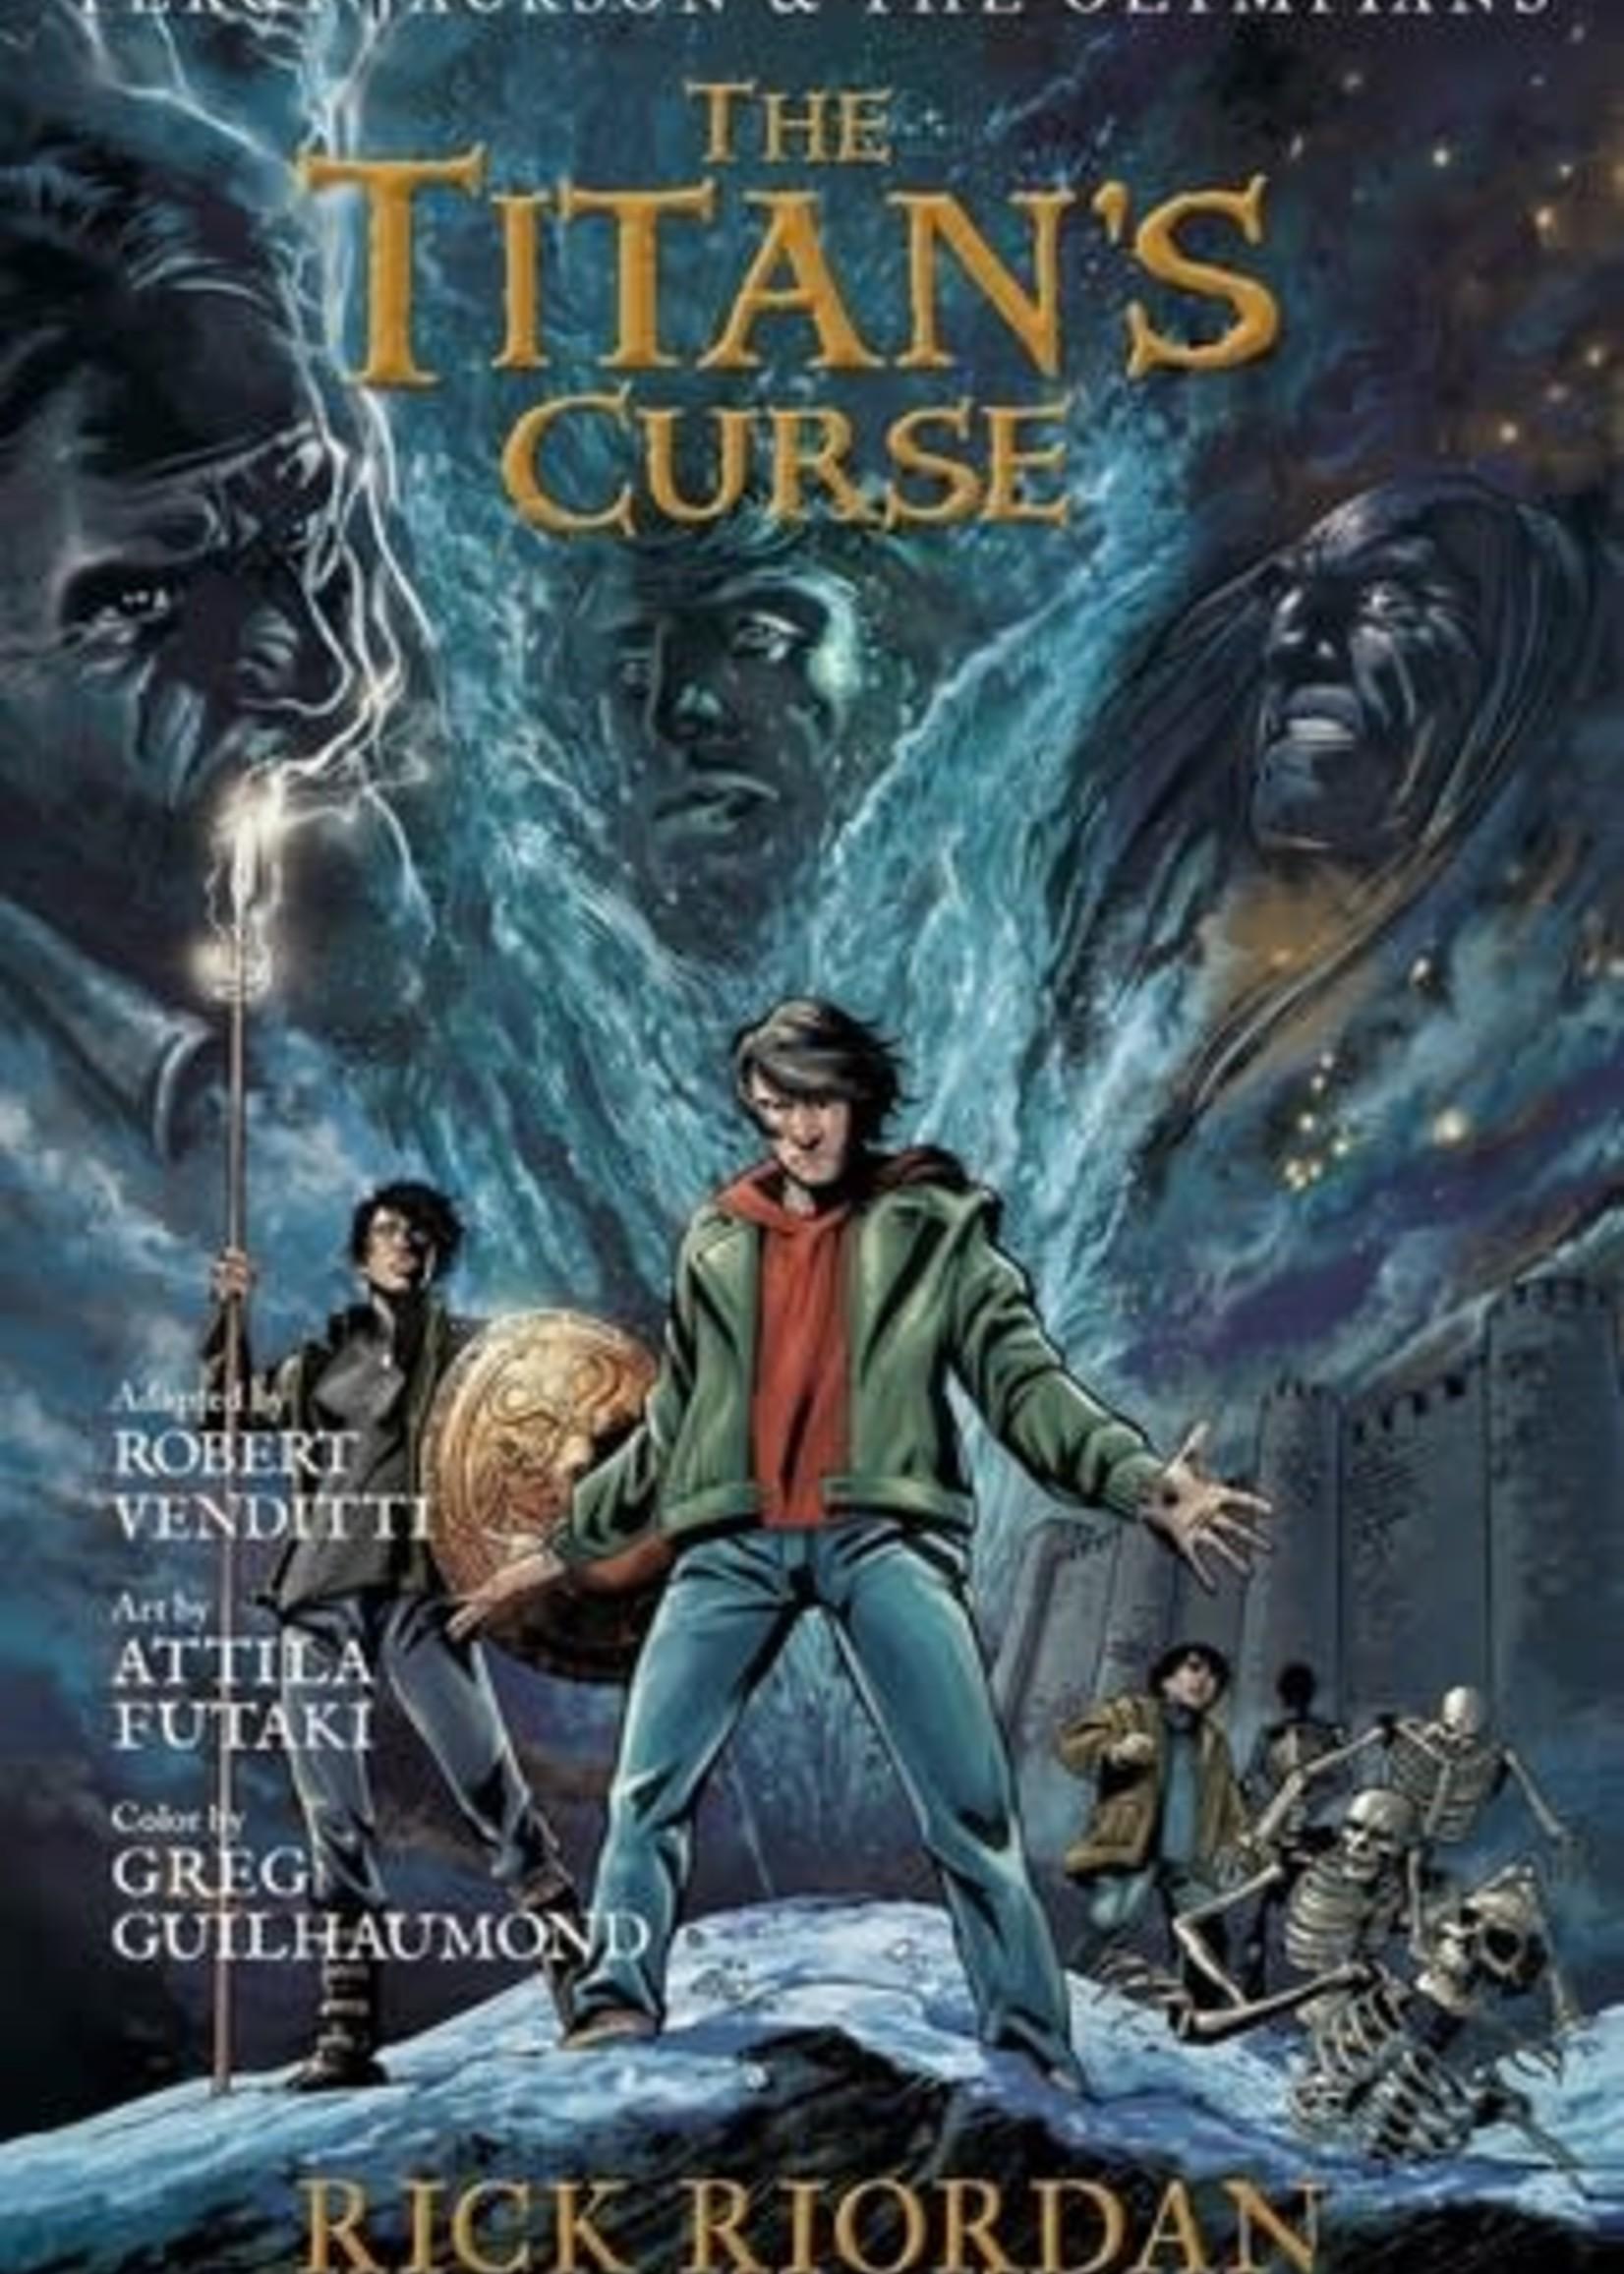 The Titan's Curse: The Graphic Novel (Percy Jackson and the Olympians: The Graphic Novels #3) by Robert Venditti,  Rick Riordan,  Attila Futaki,  Gregory Guilhaumond ,  Chris D